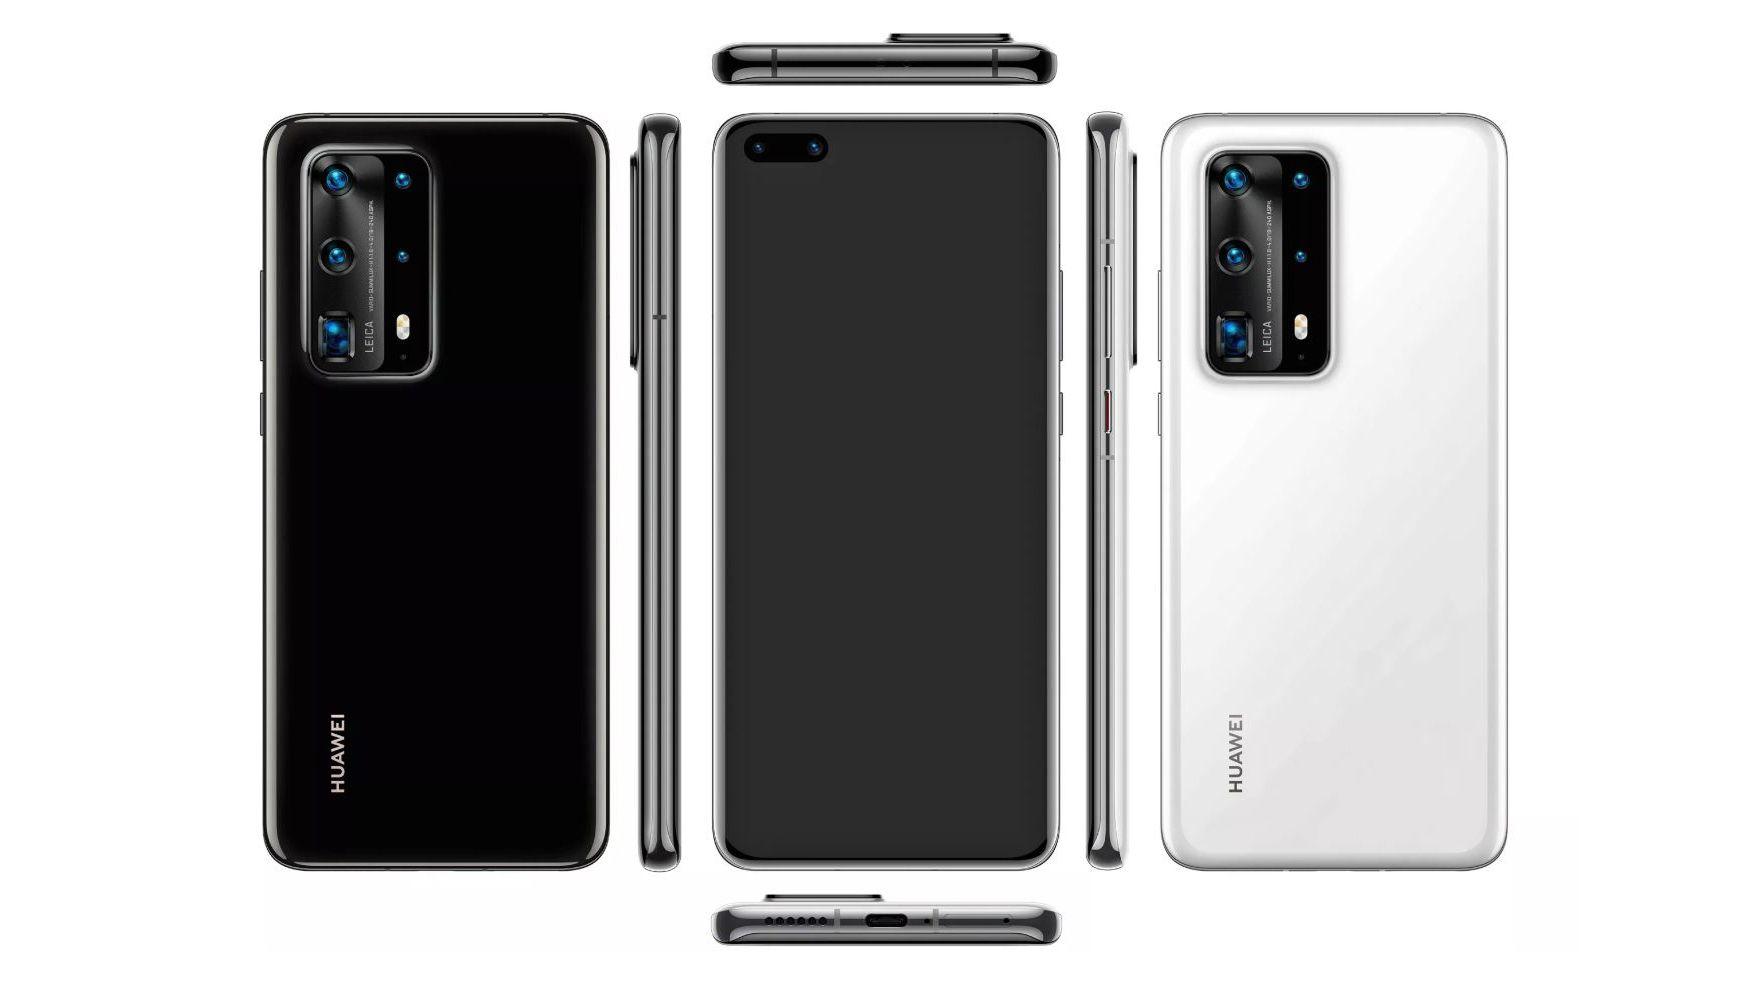 Dette skal være Huawei P40 Pro, ifølge Twitter-kjendisen Evleaks.